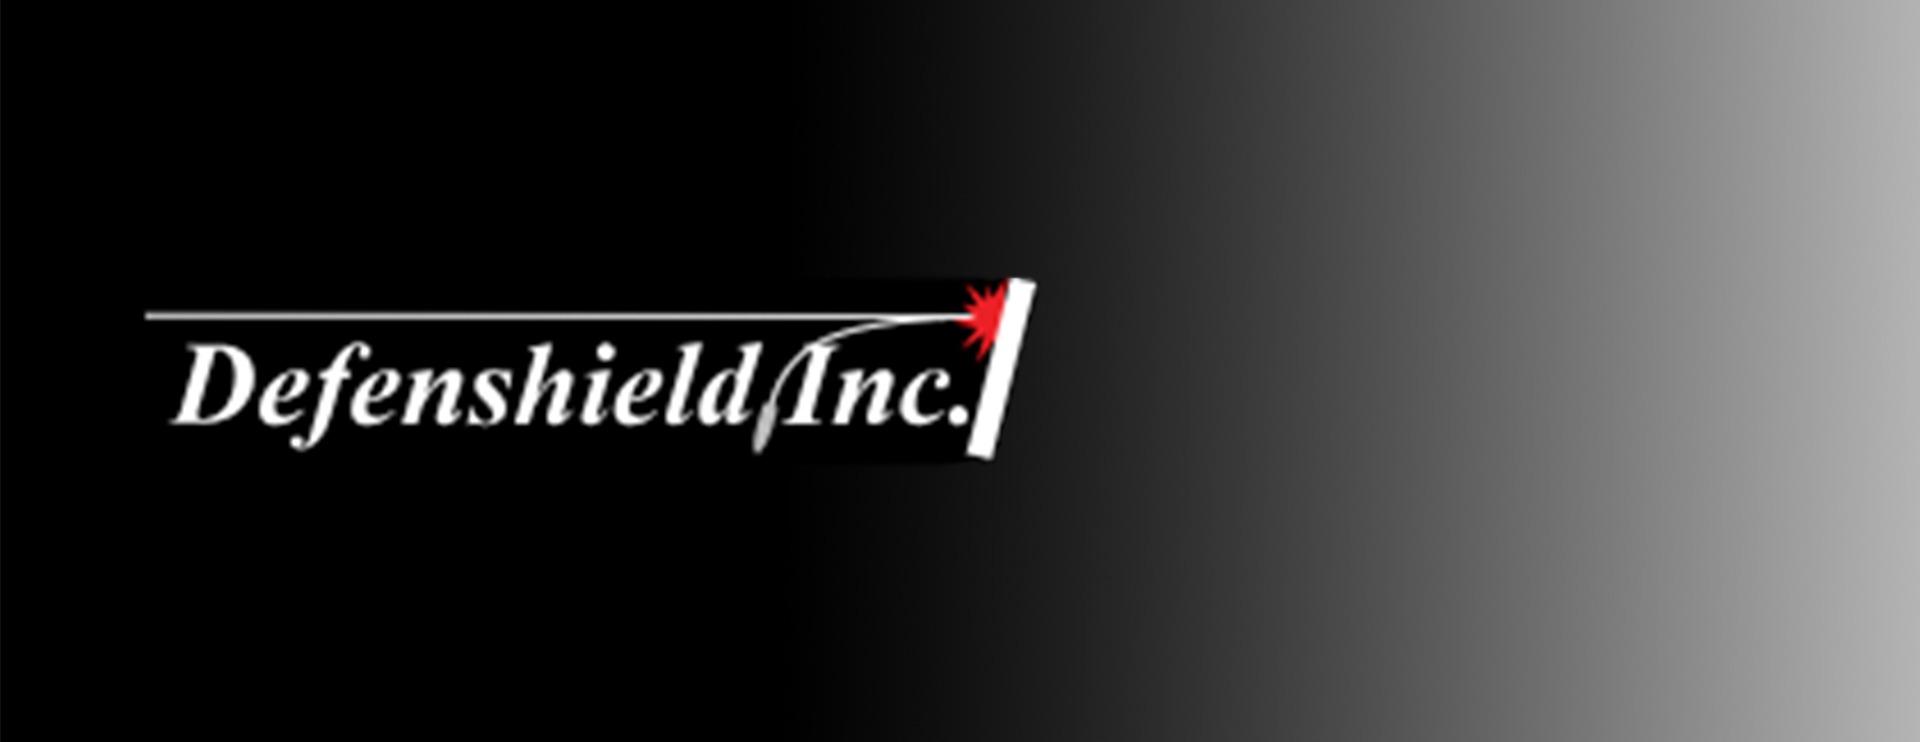 Defensheild, Inc. has Trinity customize a Quick Base CRM Application